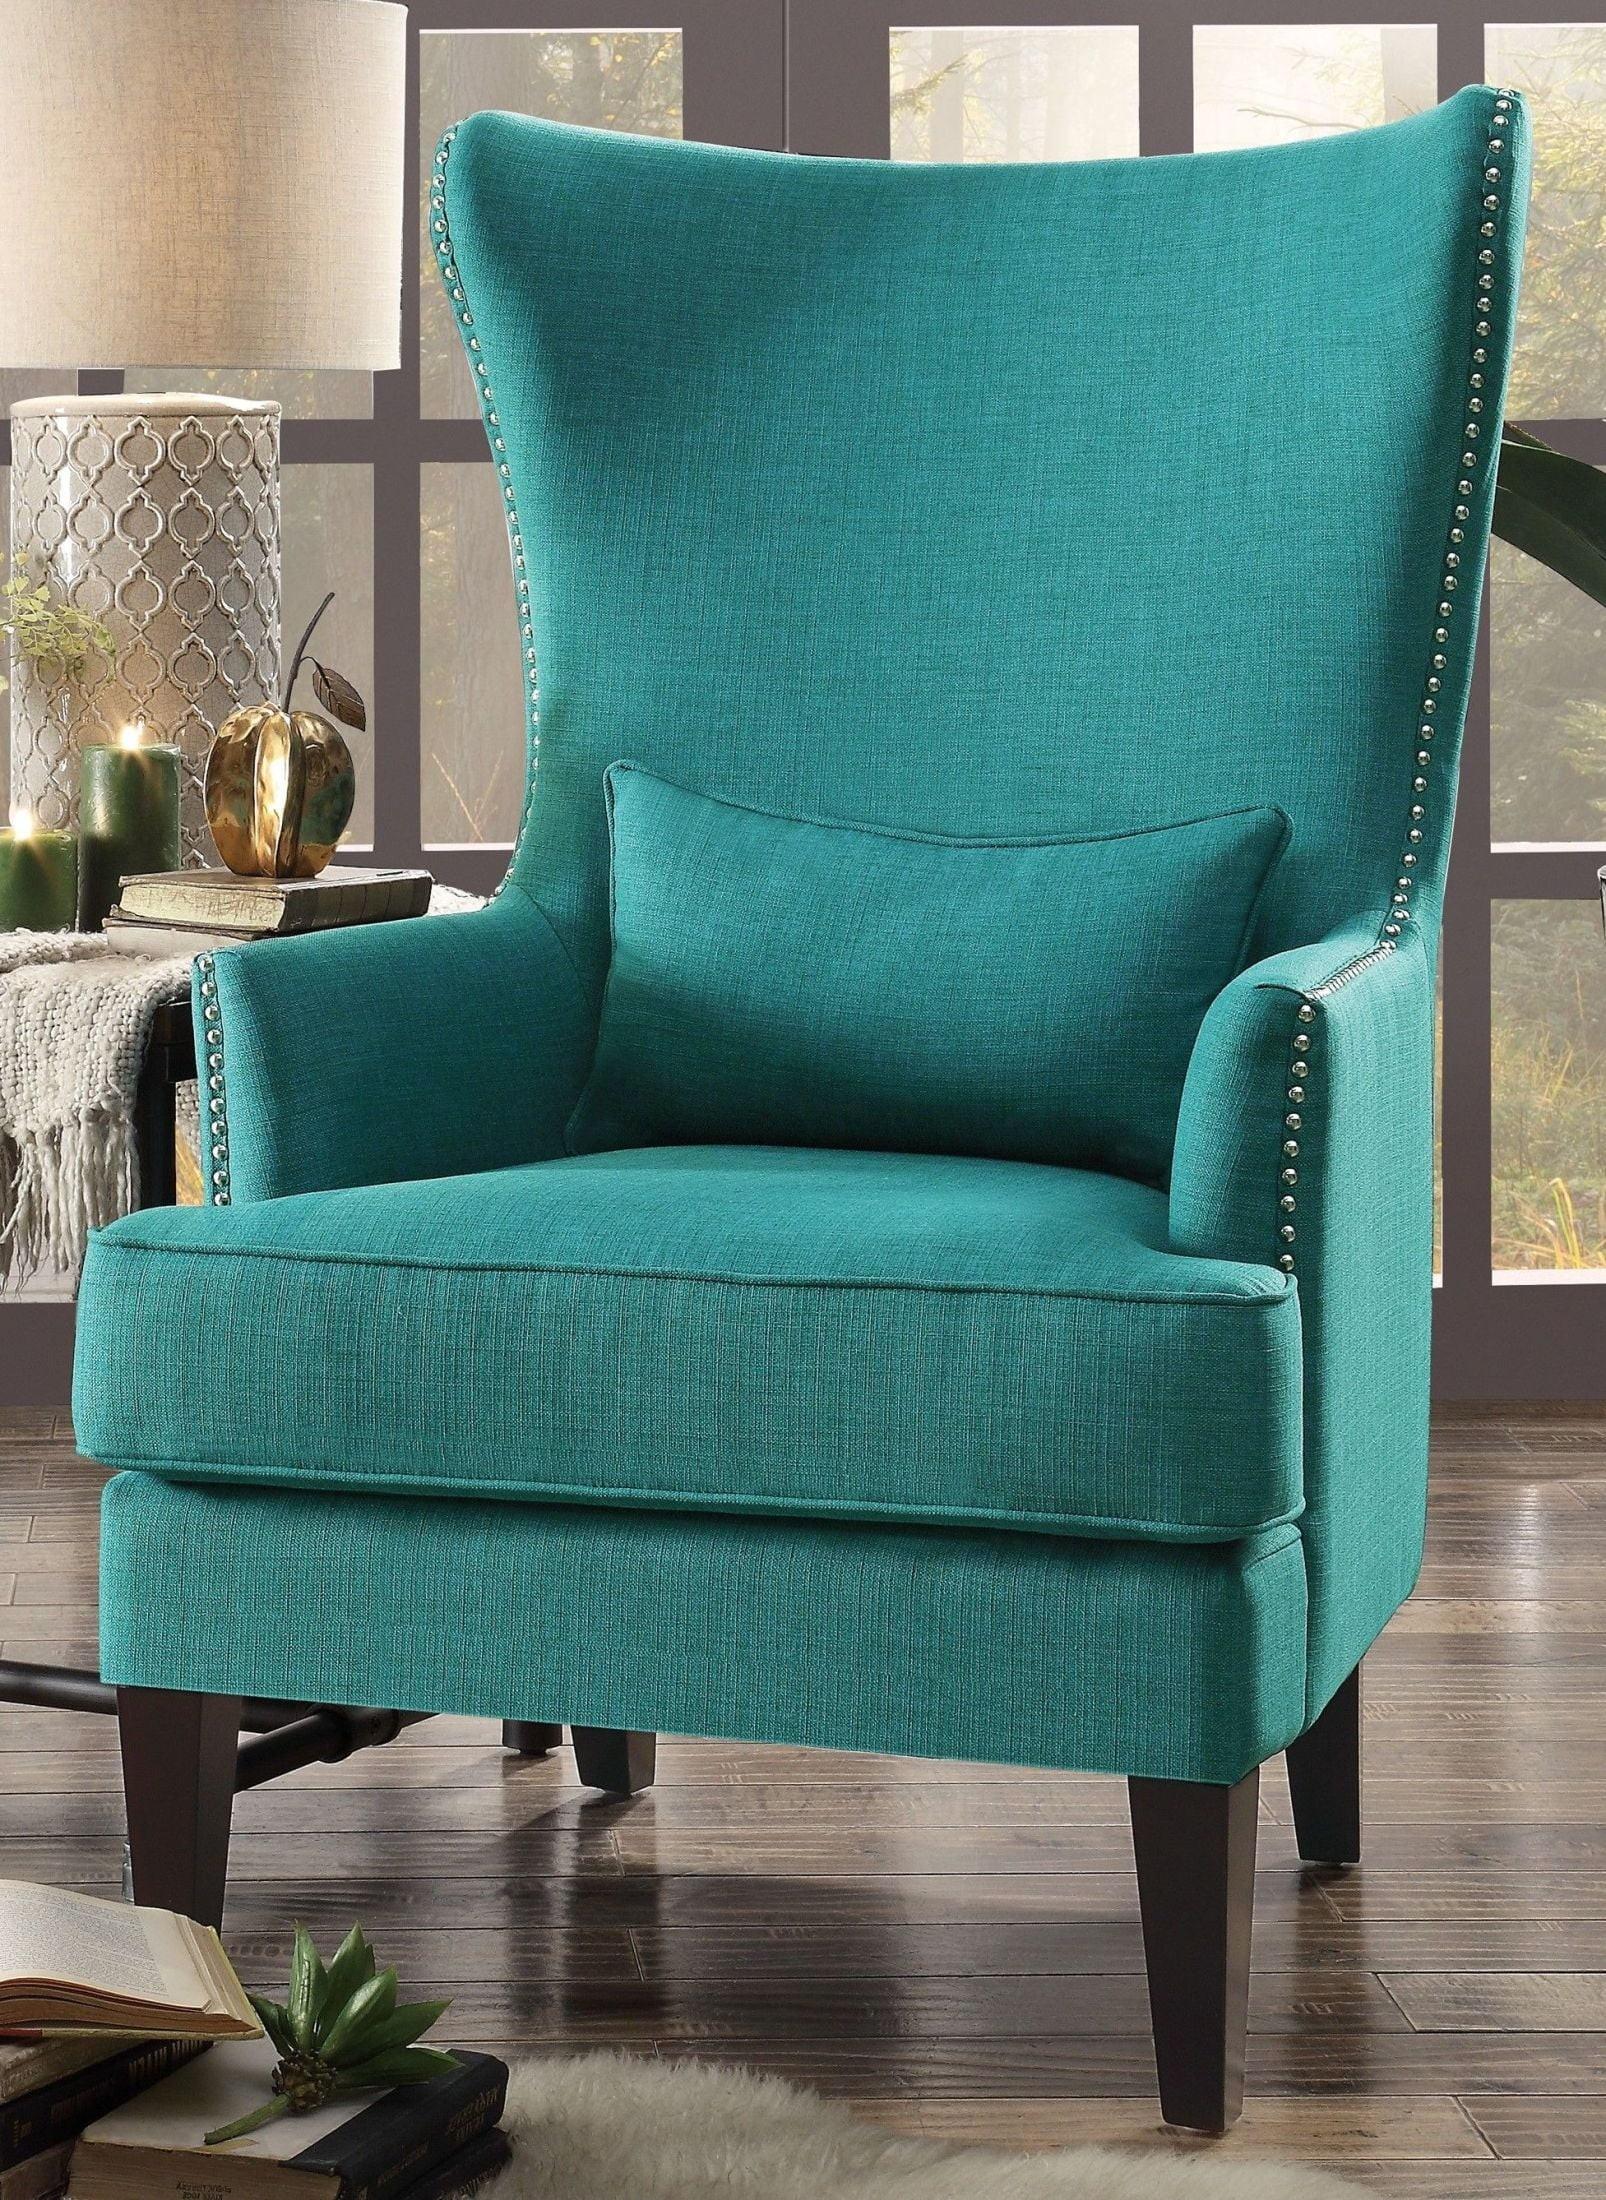 Stupendous Avina Teal Accent Chair Lamtechconsult Wood Chair Design Ideas Lamtechconsultcom